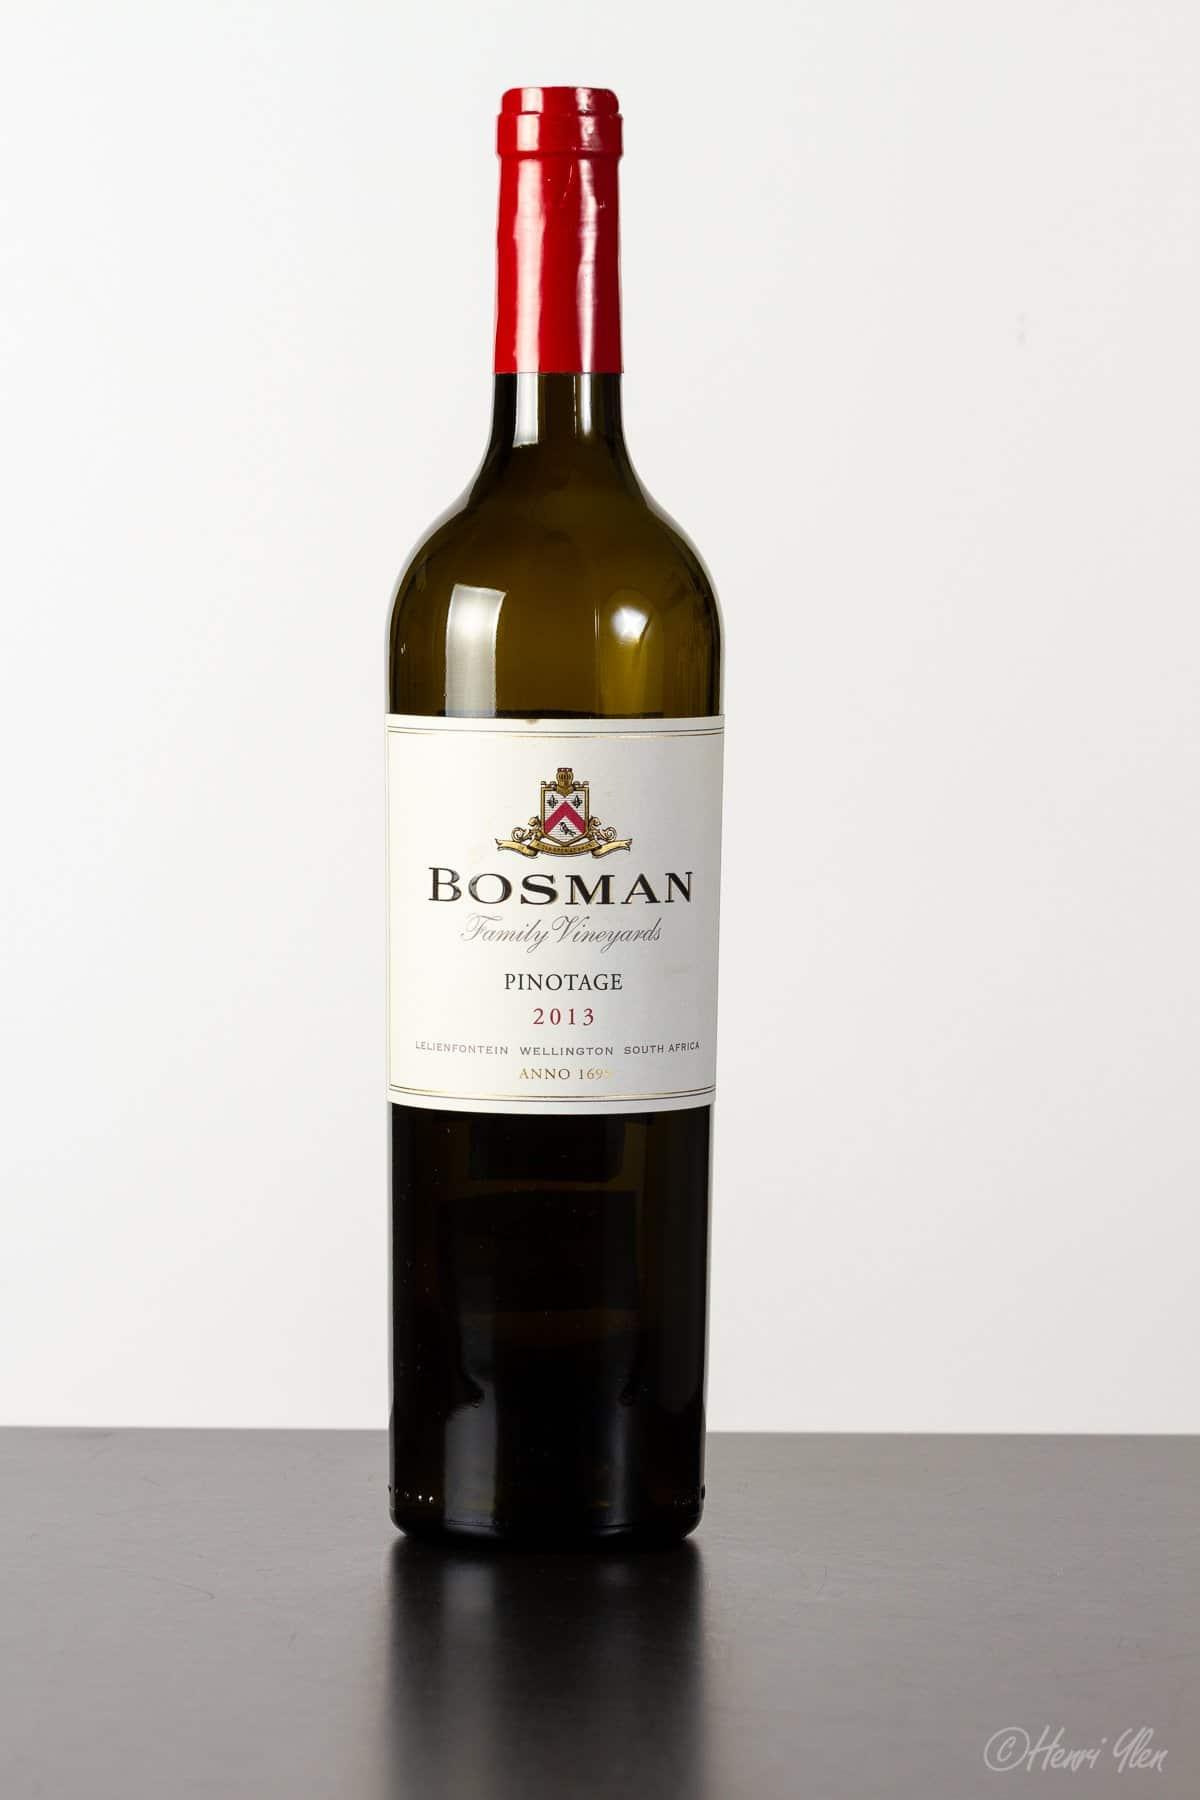 Bosman Pinotage